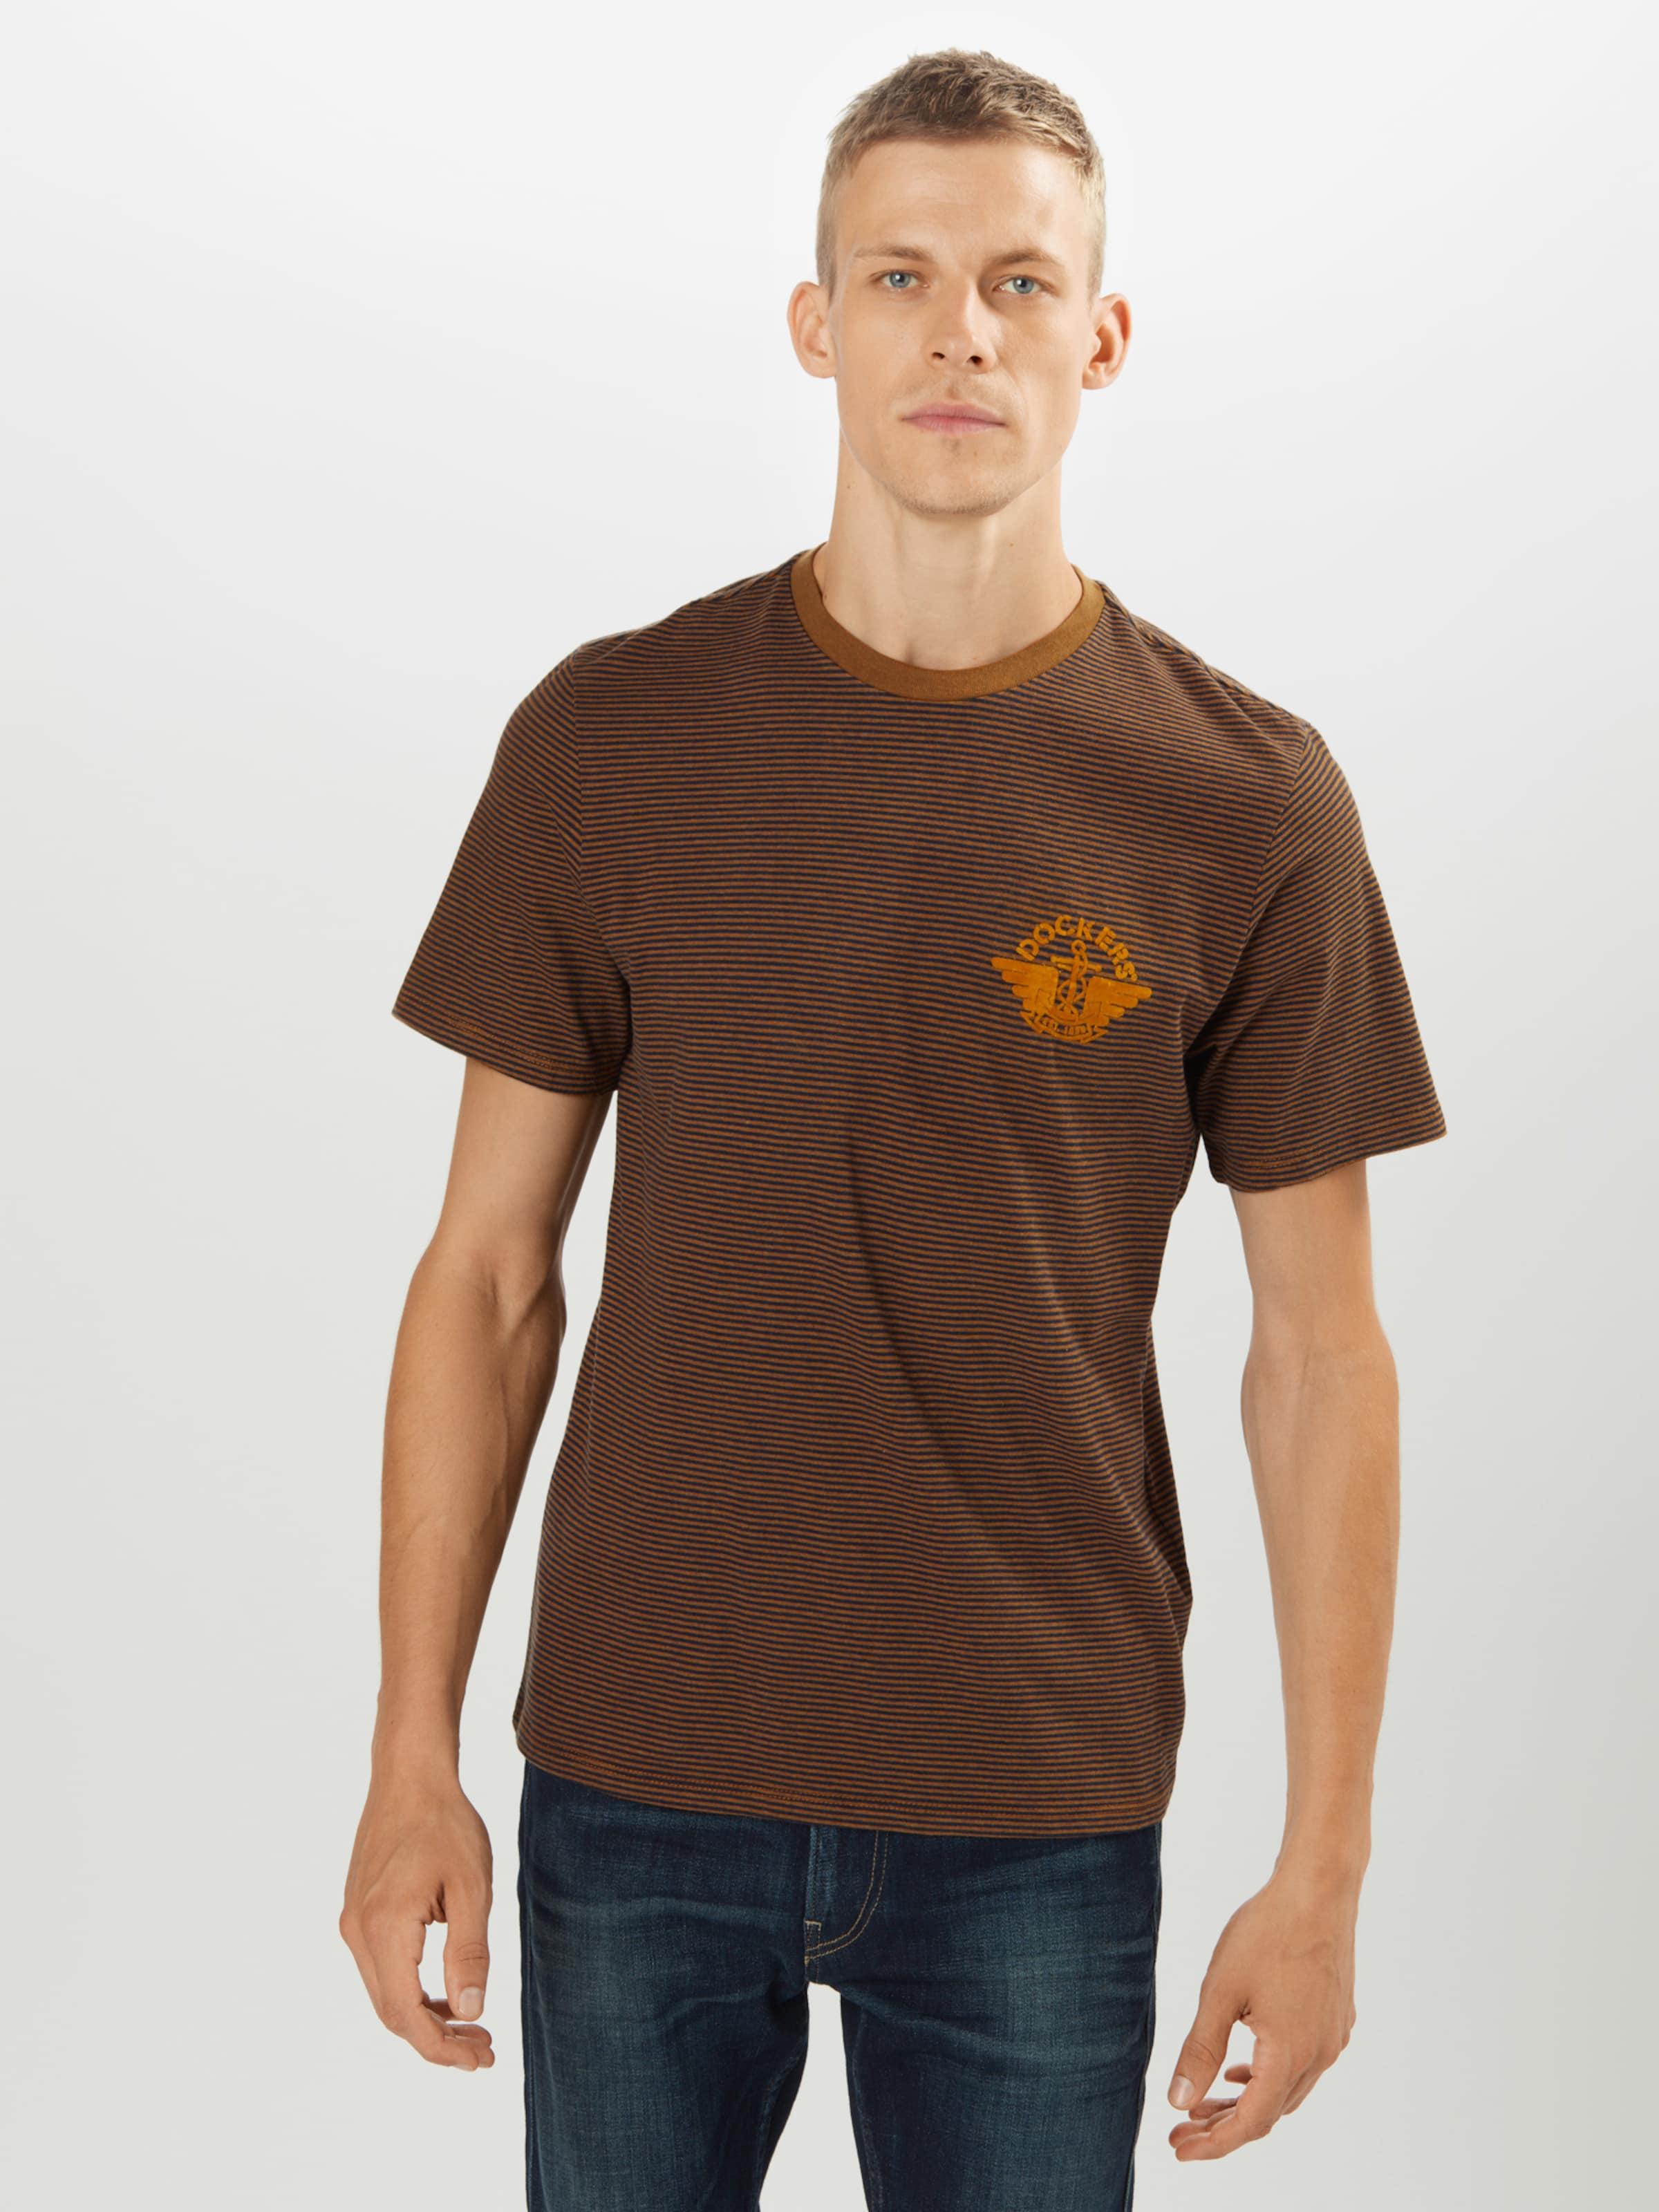 Dockers Shirt in dunkelblau / braun / honig Gestreift DOC0012007000001